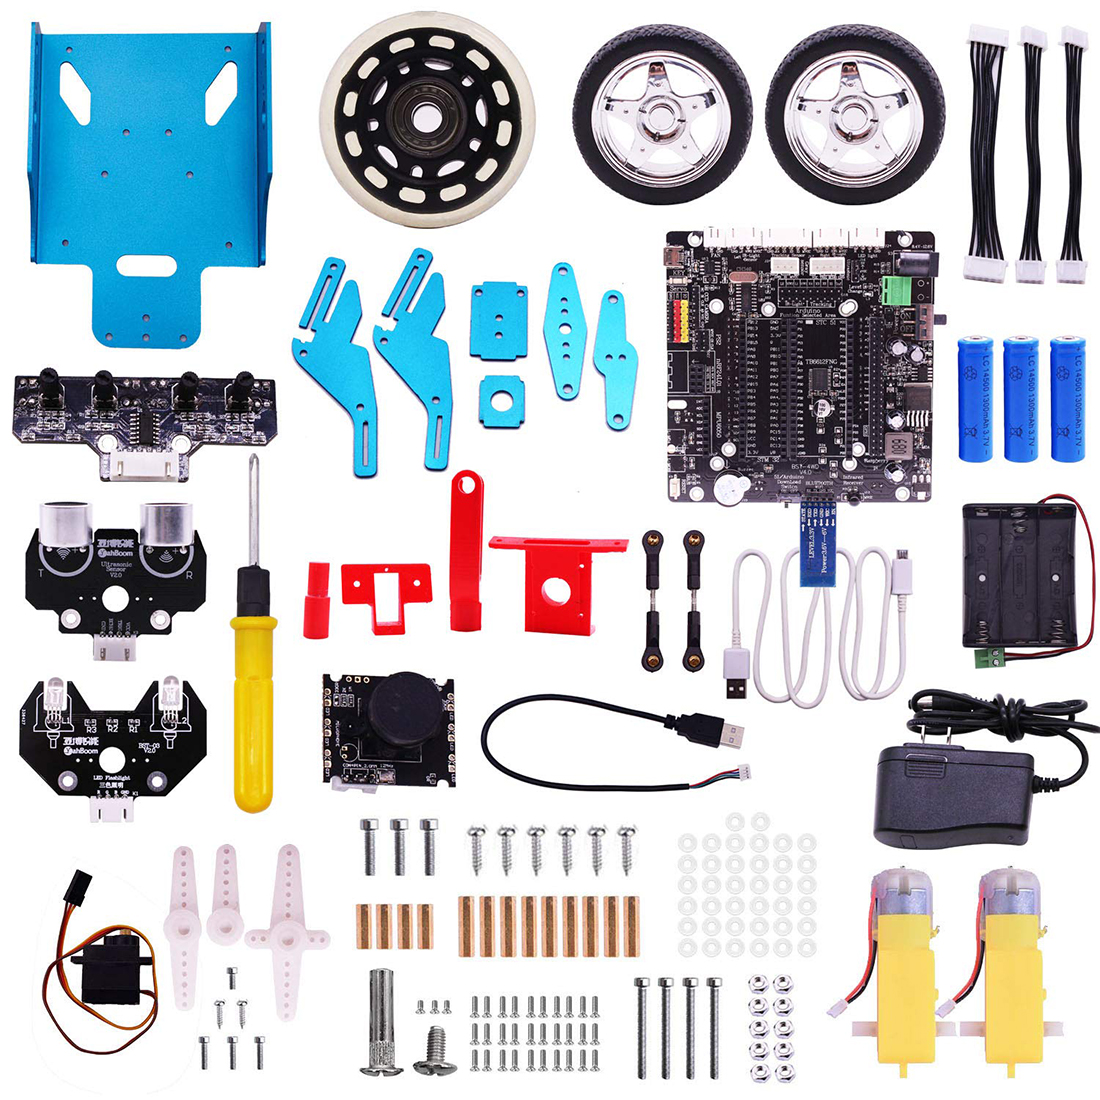 Raspberry Pi TrikeBot Smart Robot Car Kit Programmable Learning with HD Camera Video DIY Robot Model Building Block Kit 2019